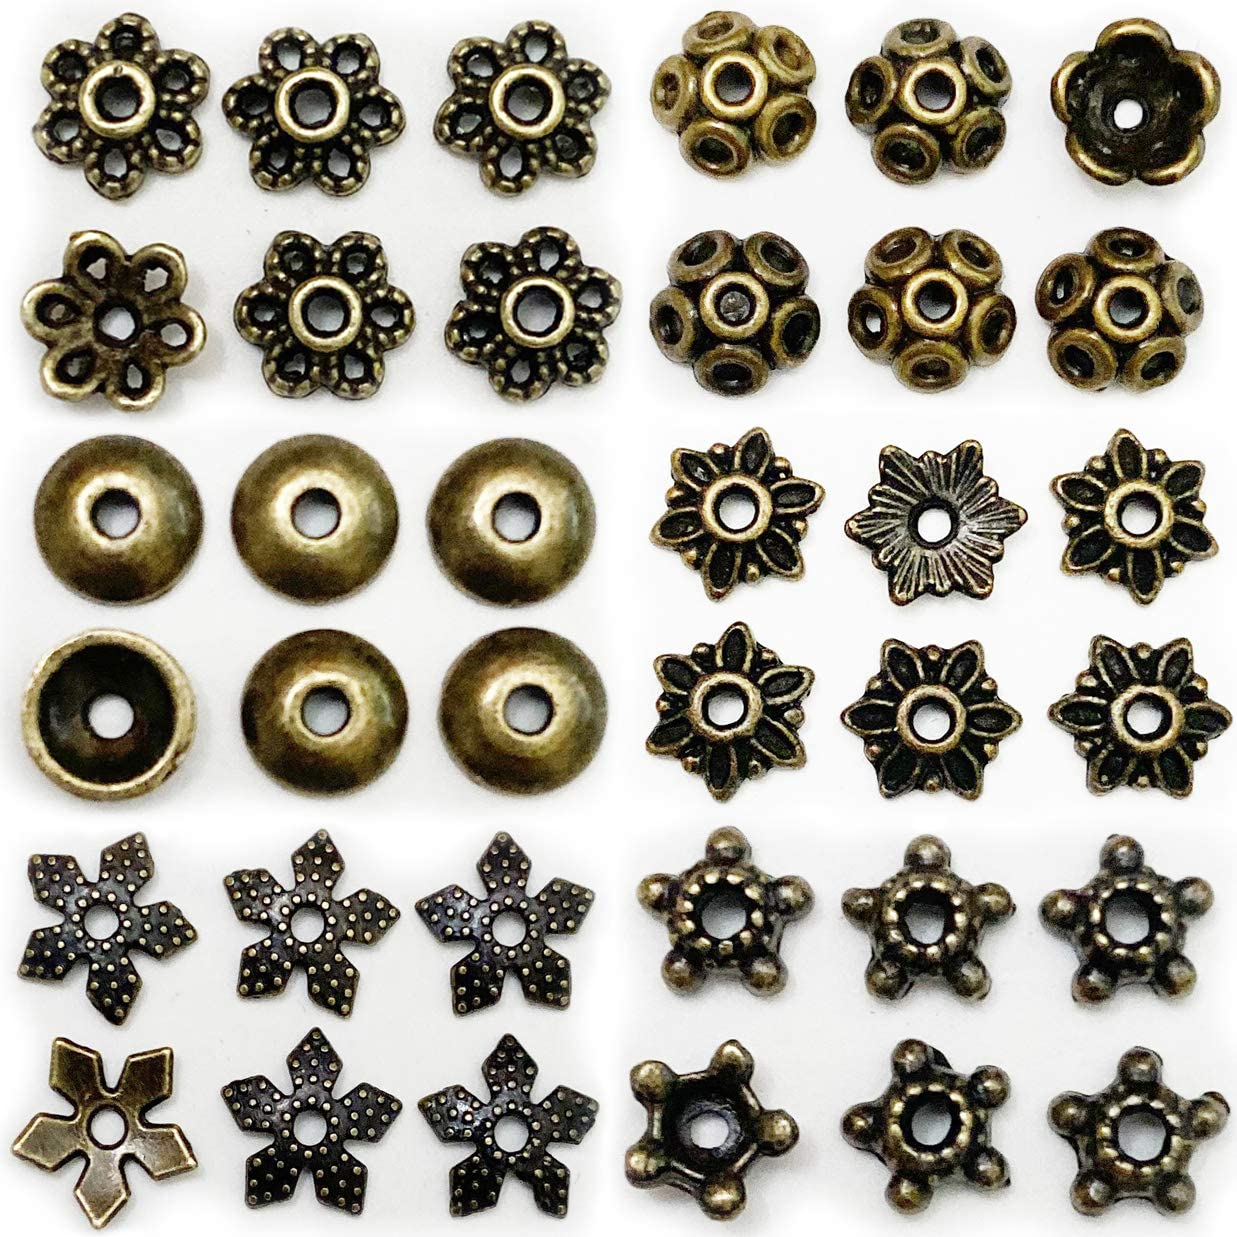 Zinc Alloy Nickel 50 pcs 13 mm Antique Bronze Bead Caps 13 mm bead cap antique bronze findings Lead free and Cadmium free